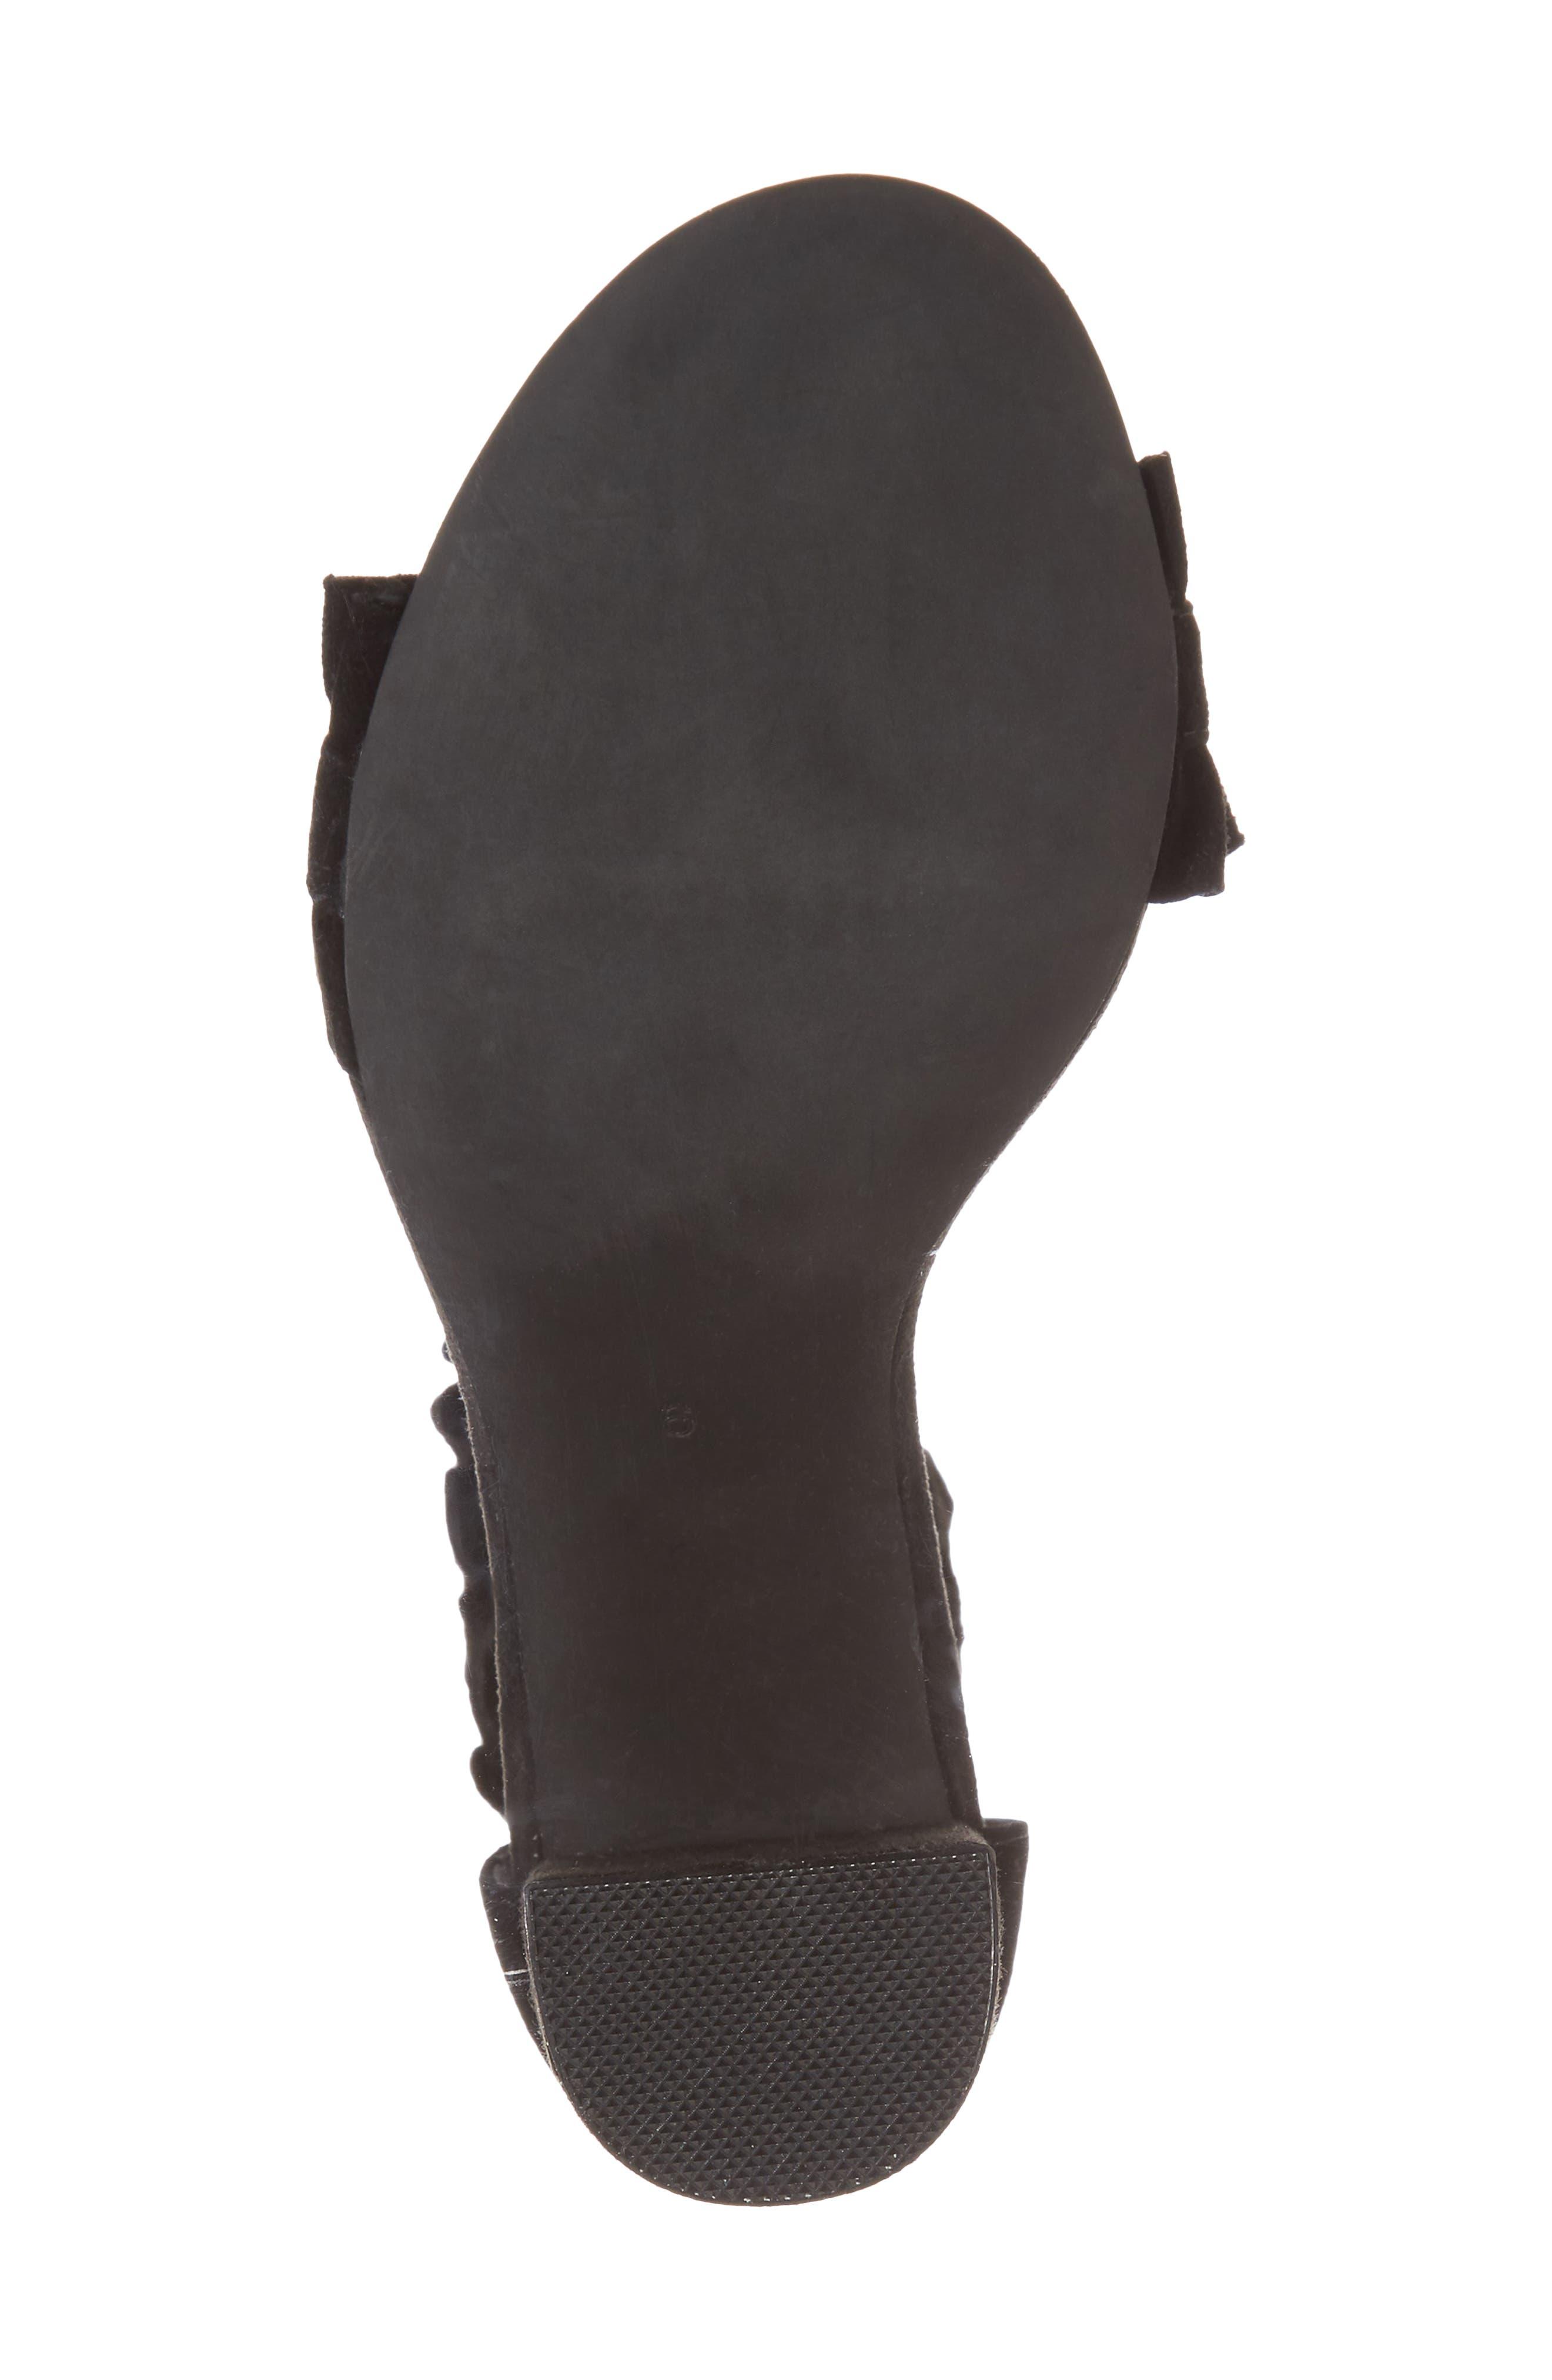 Lindsay Dome Studded Sandal,                             Alternate thumbnail 6, color,                             004